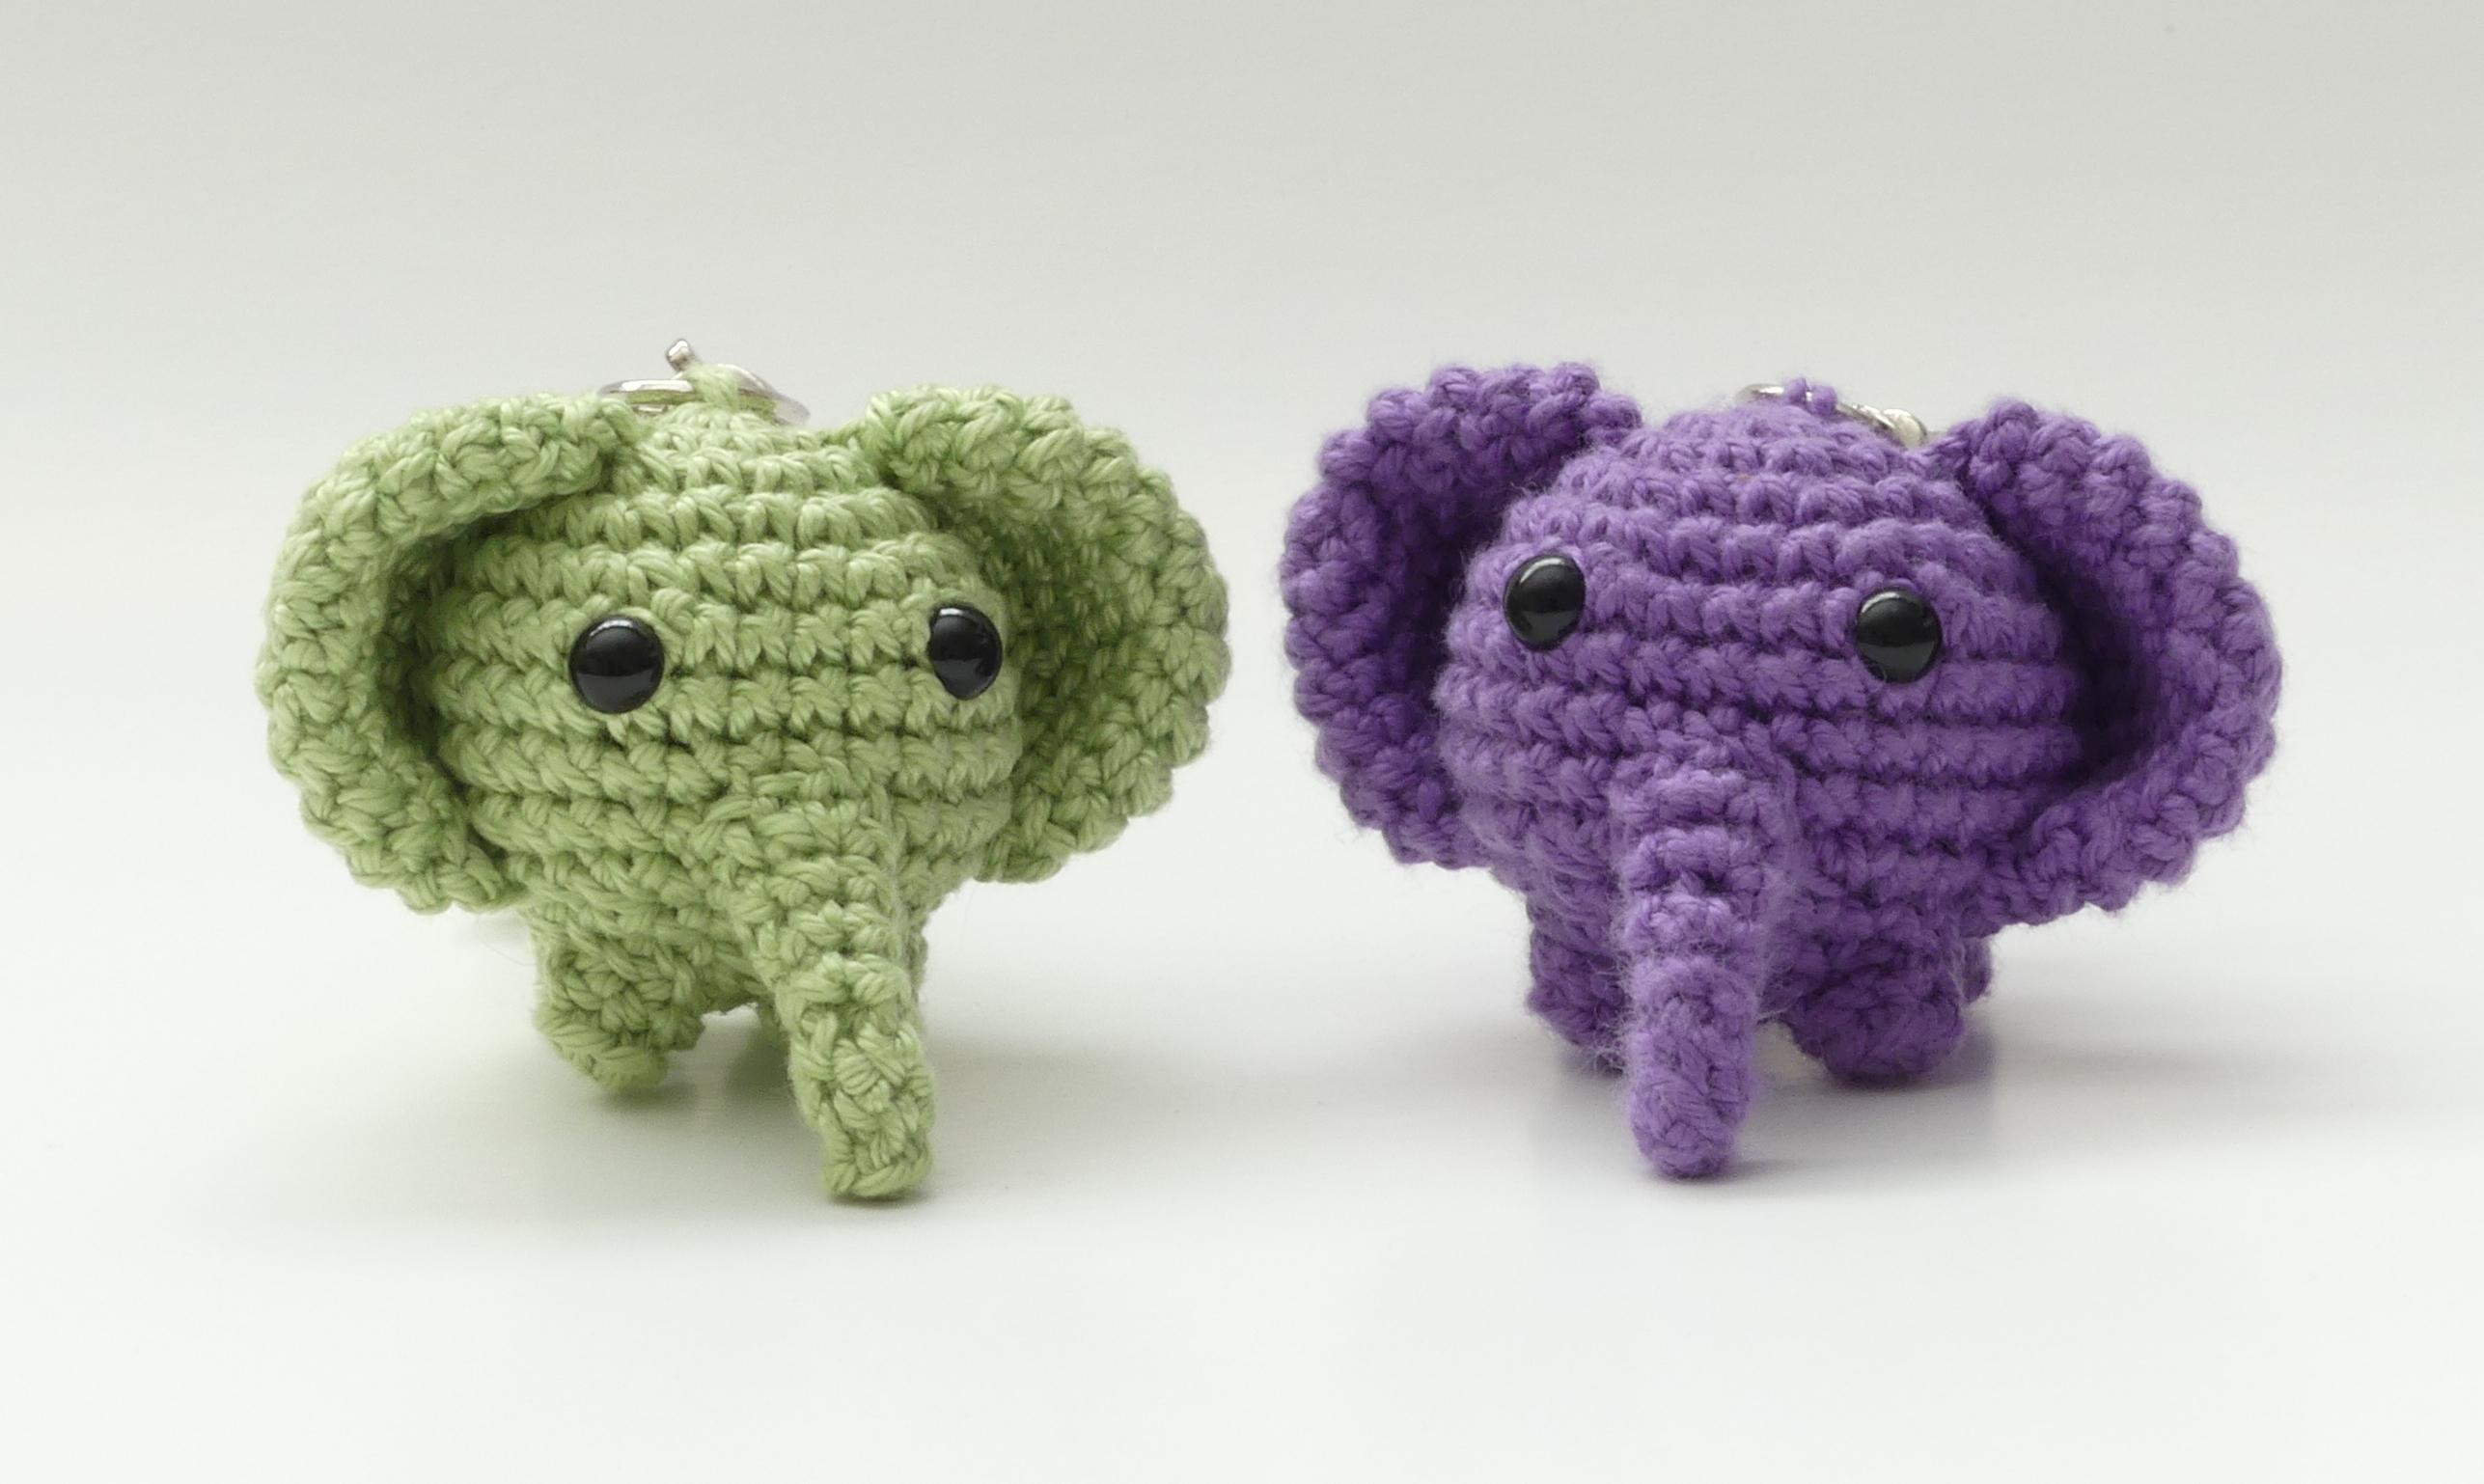 Crochet Elephant Amigurumi Key Chain | Crochet elephant pattern ... | 1538x2574